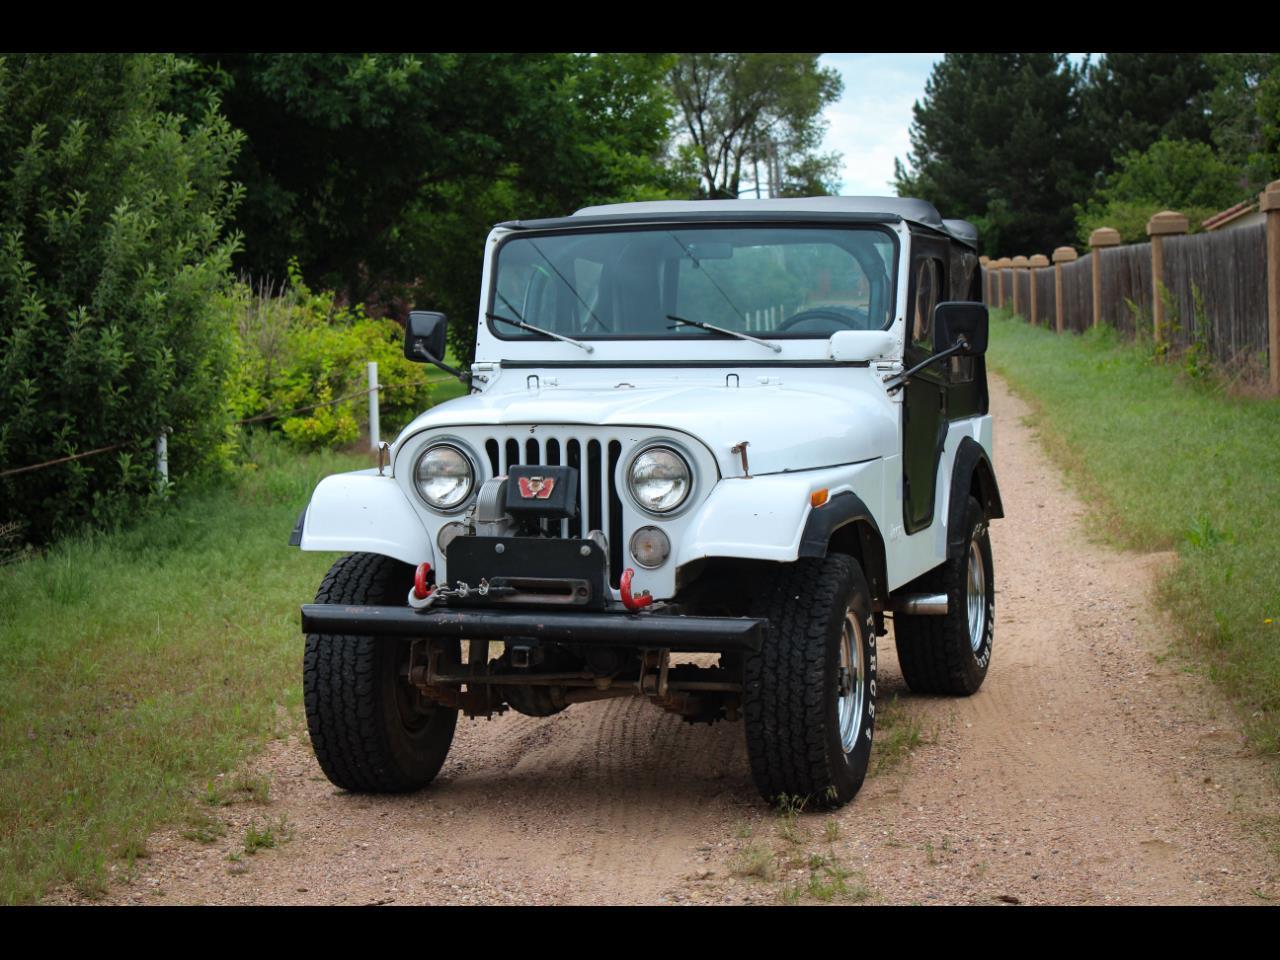 Large Picture of 1974 Jeep CJ5 located in Greeley Colorado - $6,500.00 - QEBK